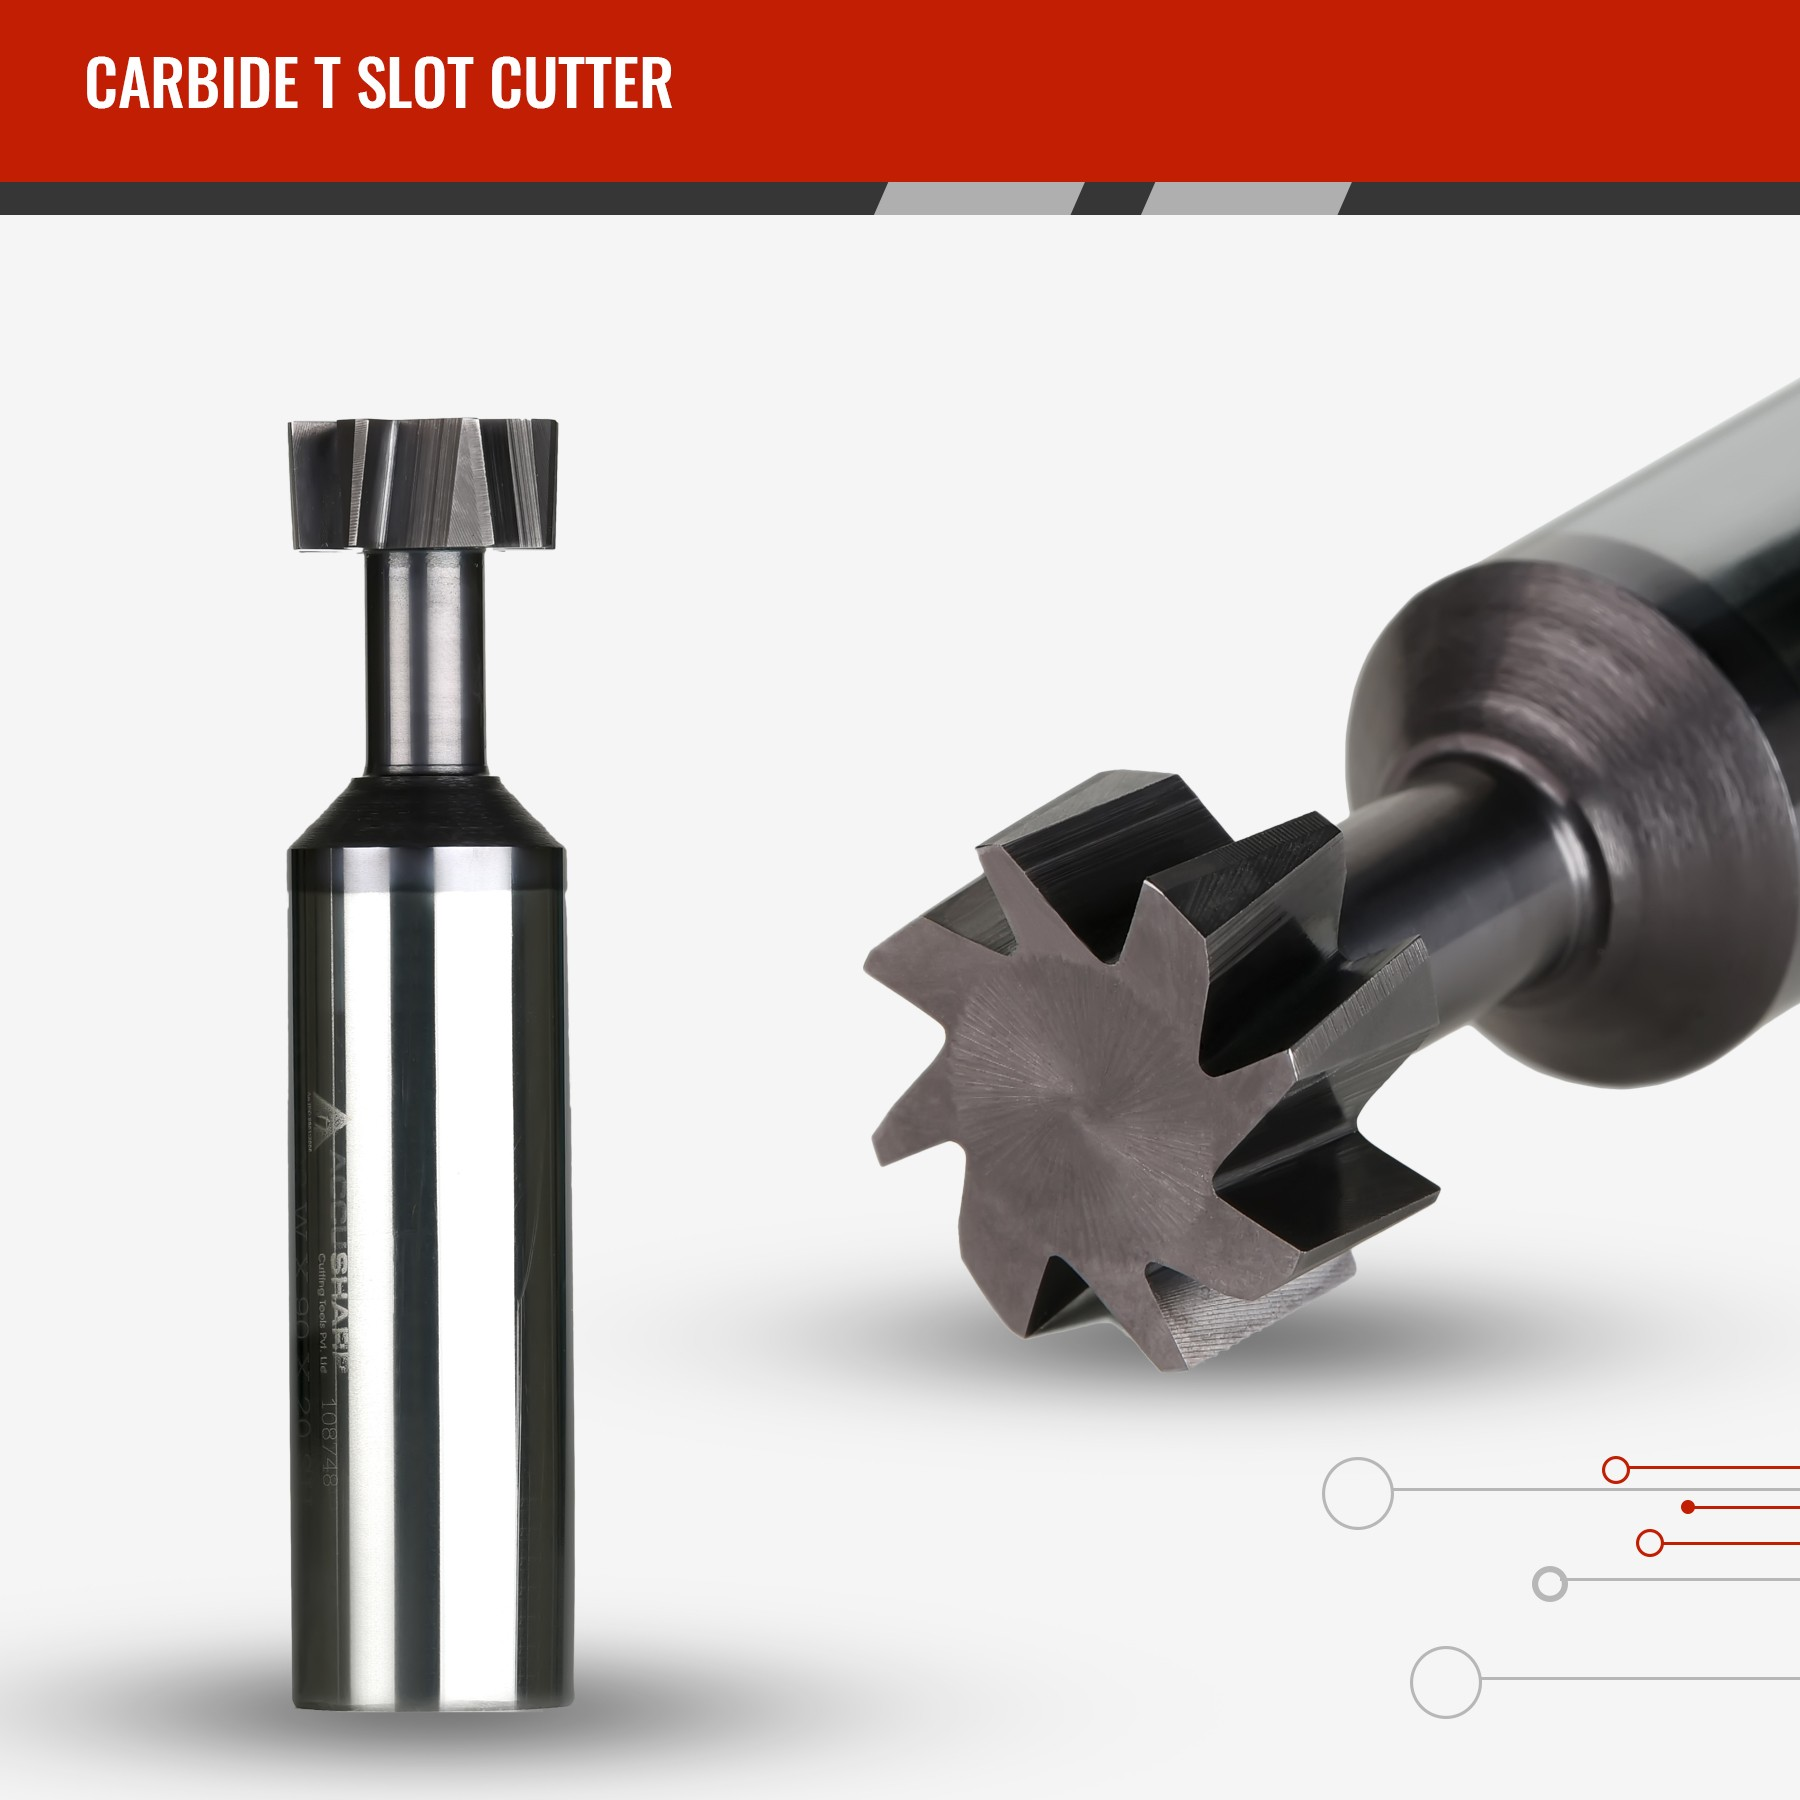 Carbide T Slot Cutter